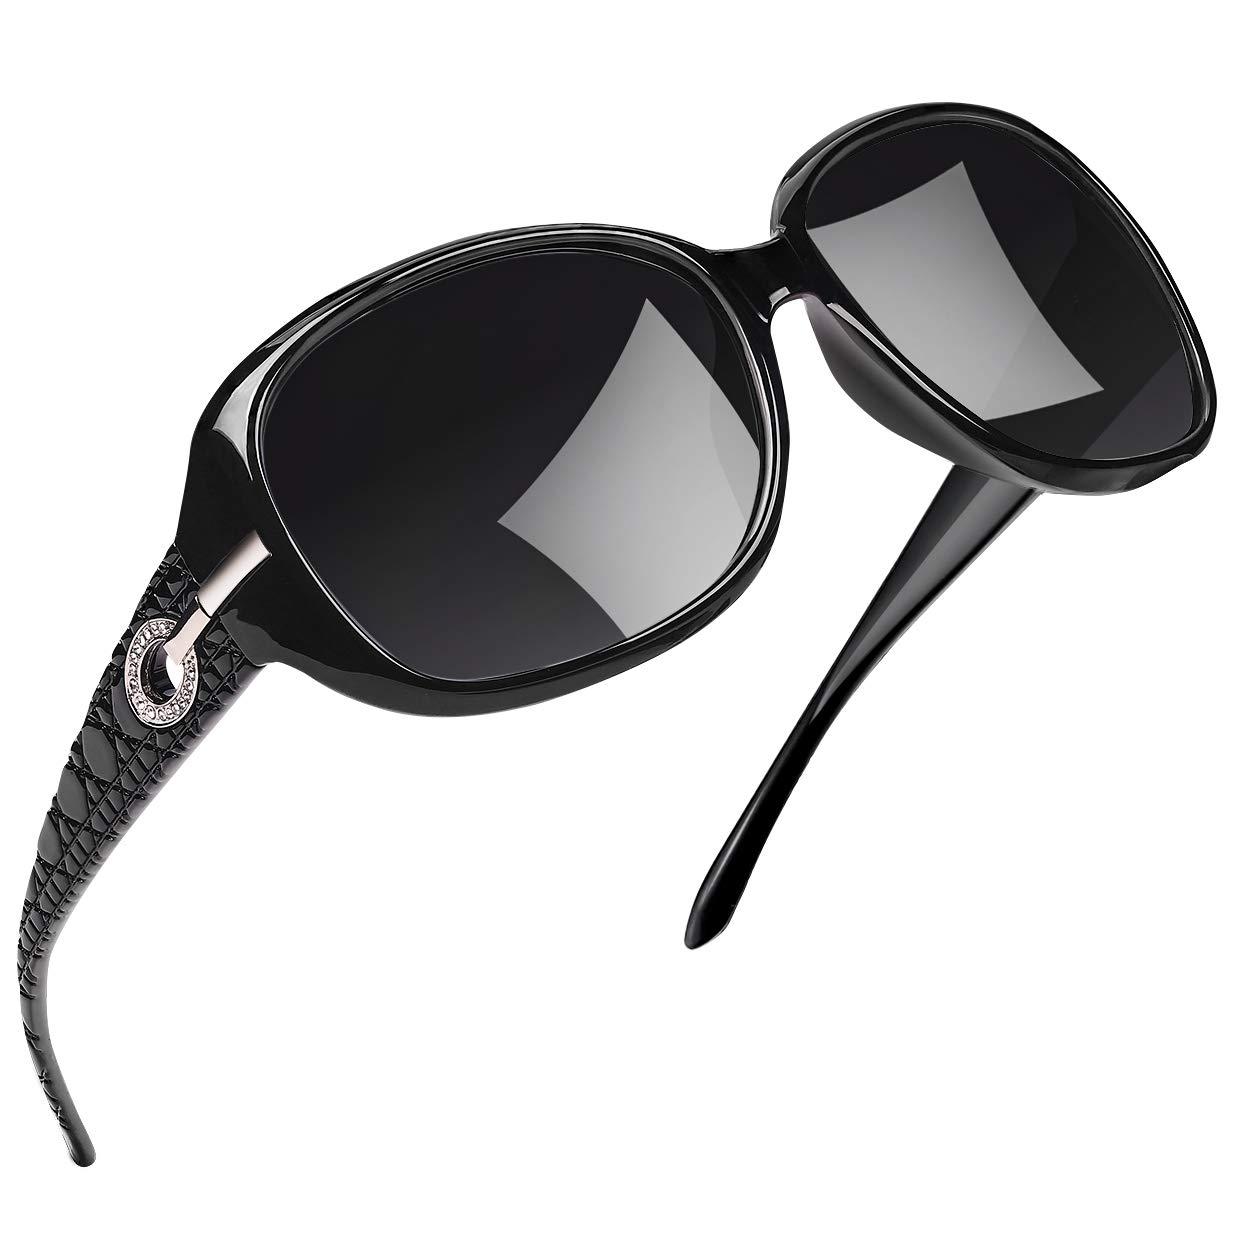 Joopin Polarized Sunglasses for Women Vintage Big Frame Sun Glasses Ladies Shades (Black) by Joopin